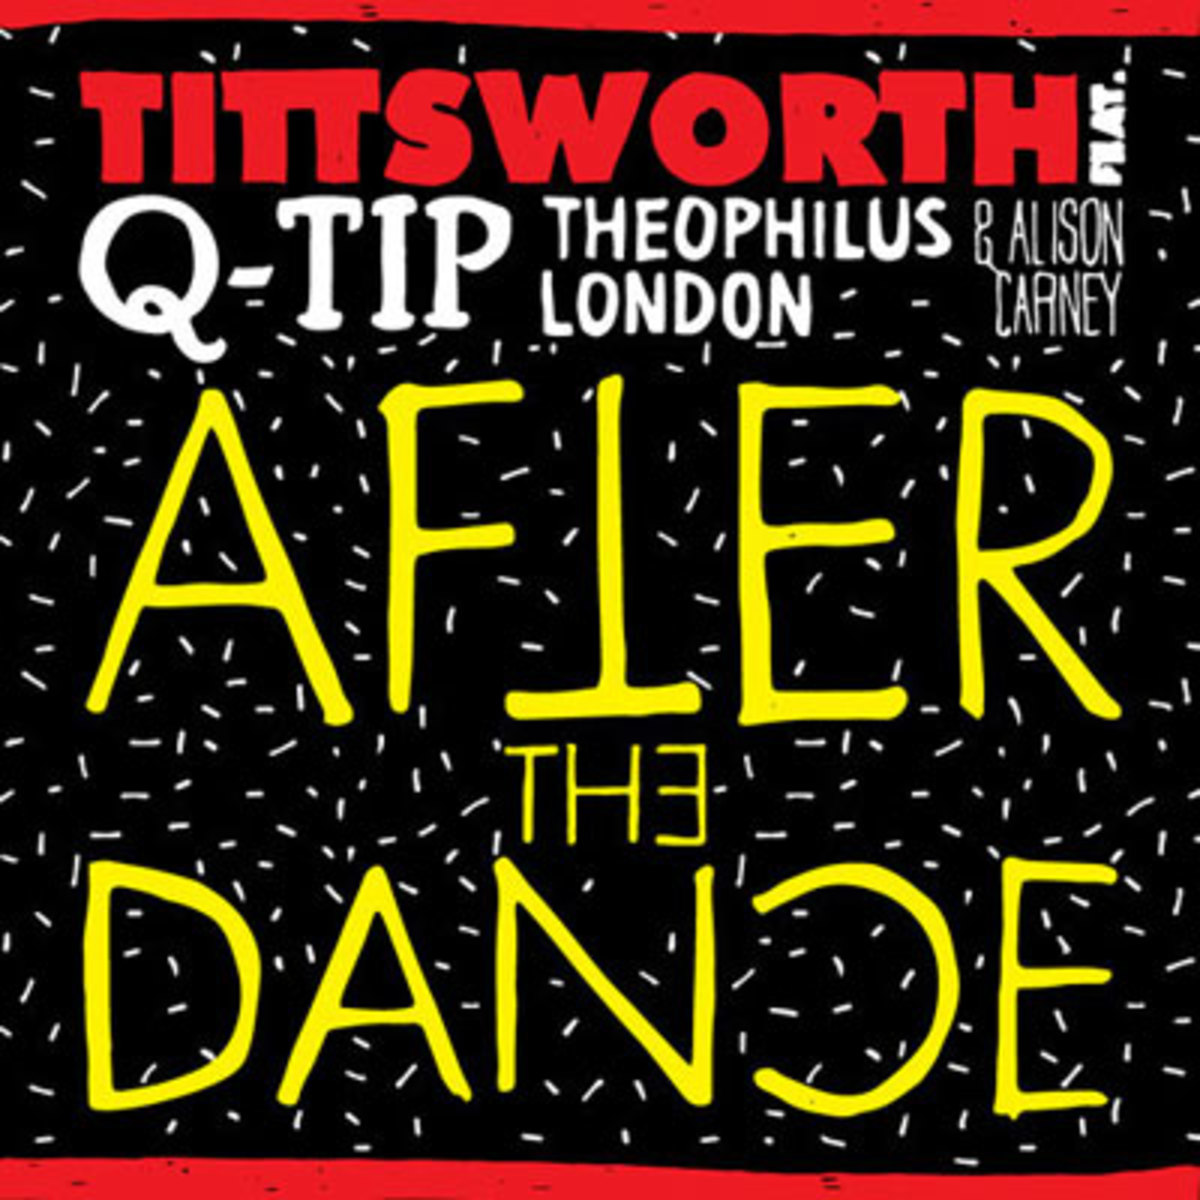 tittsworth-afterdance.jpg